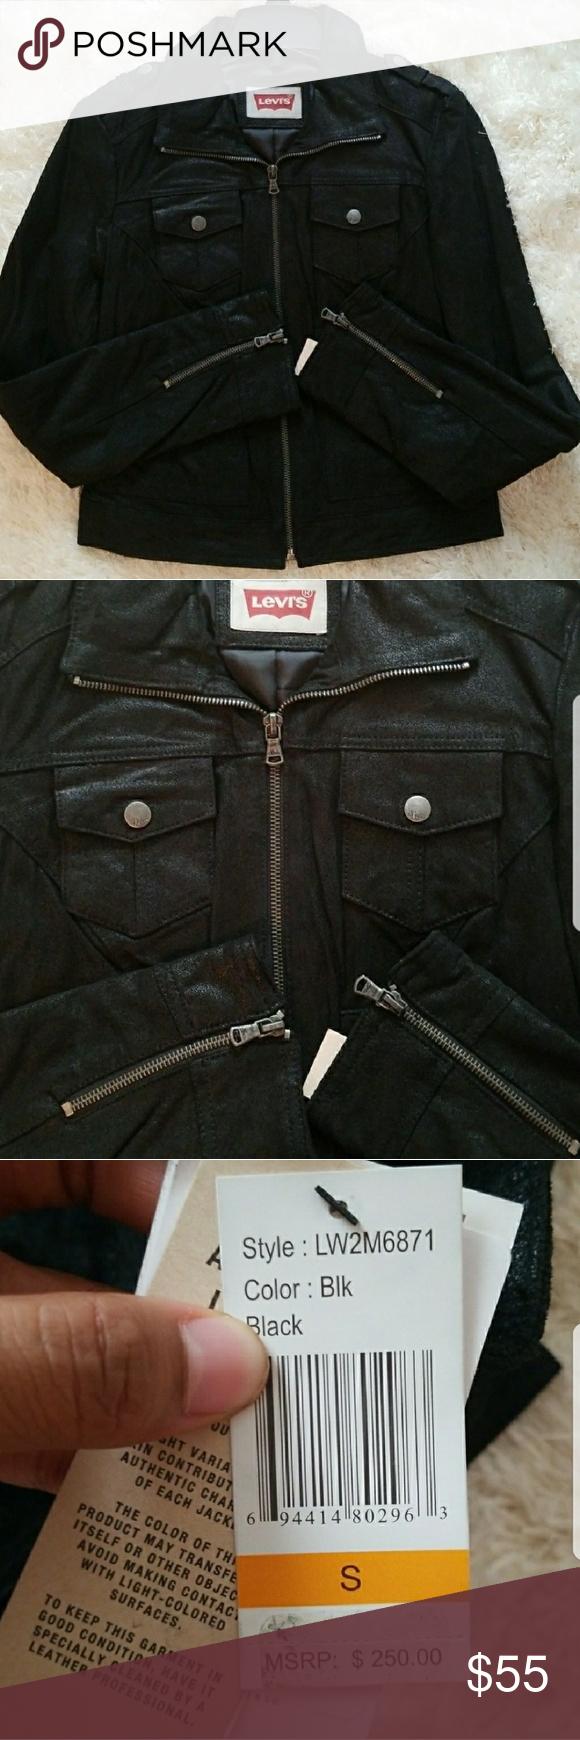 Levi's Moto leather jacket NWT Authentic leather